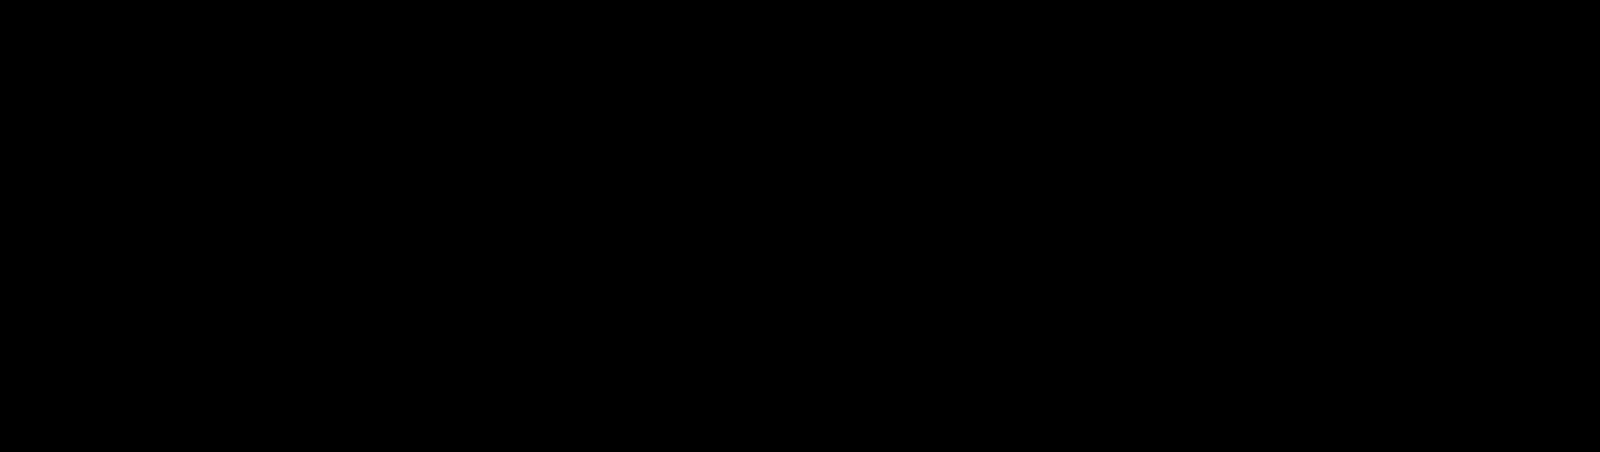 M12532MPS中文资料